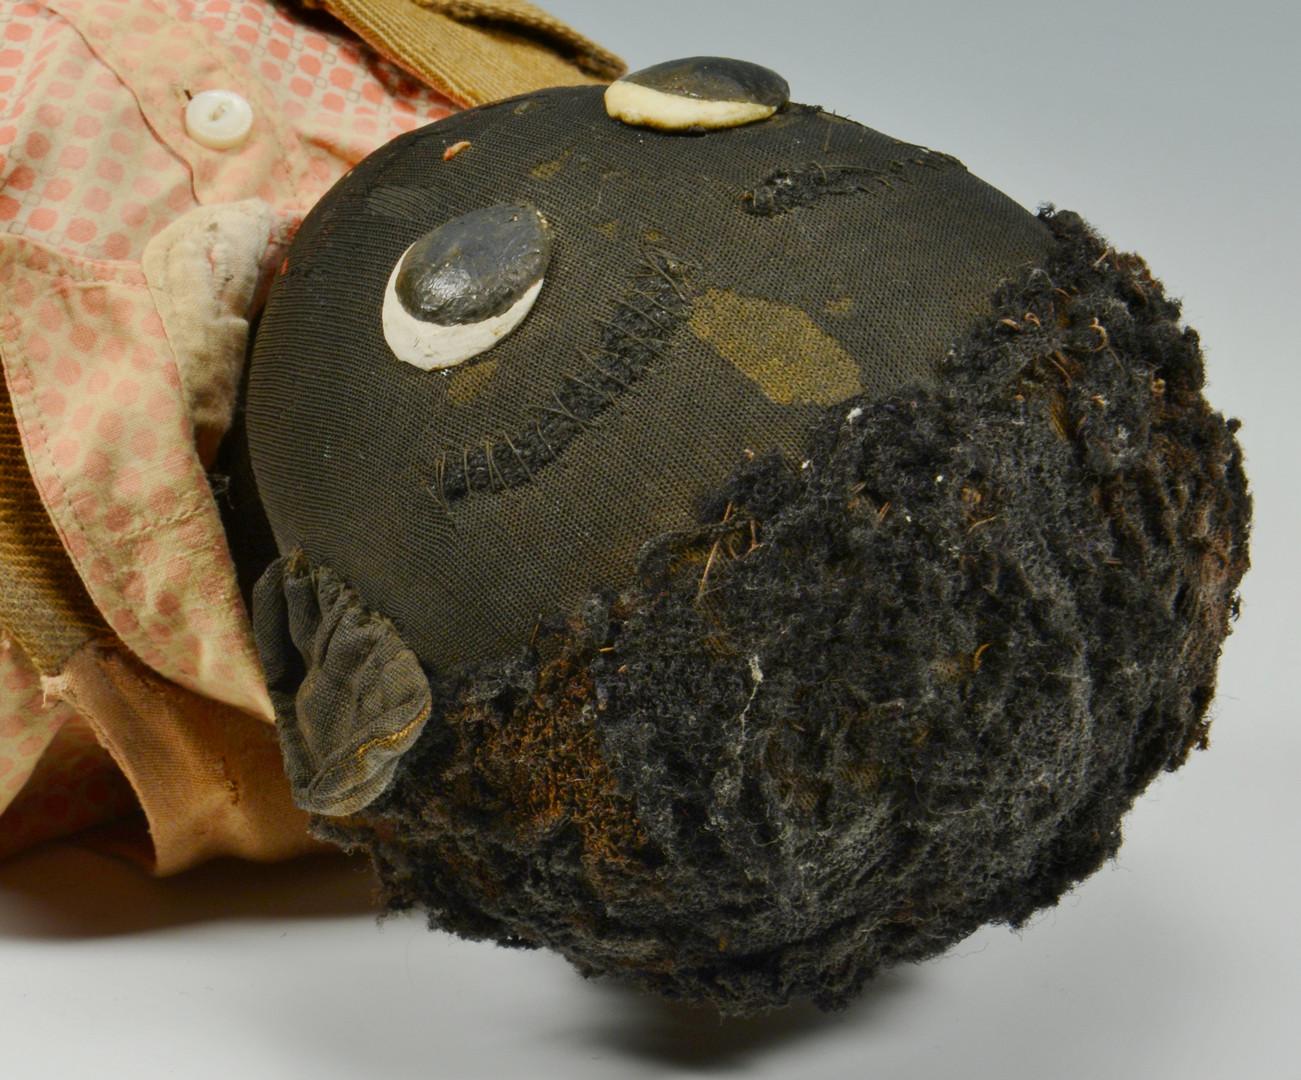 Lot 159: Pr. of 19th Cent. Handmade Black Dolls